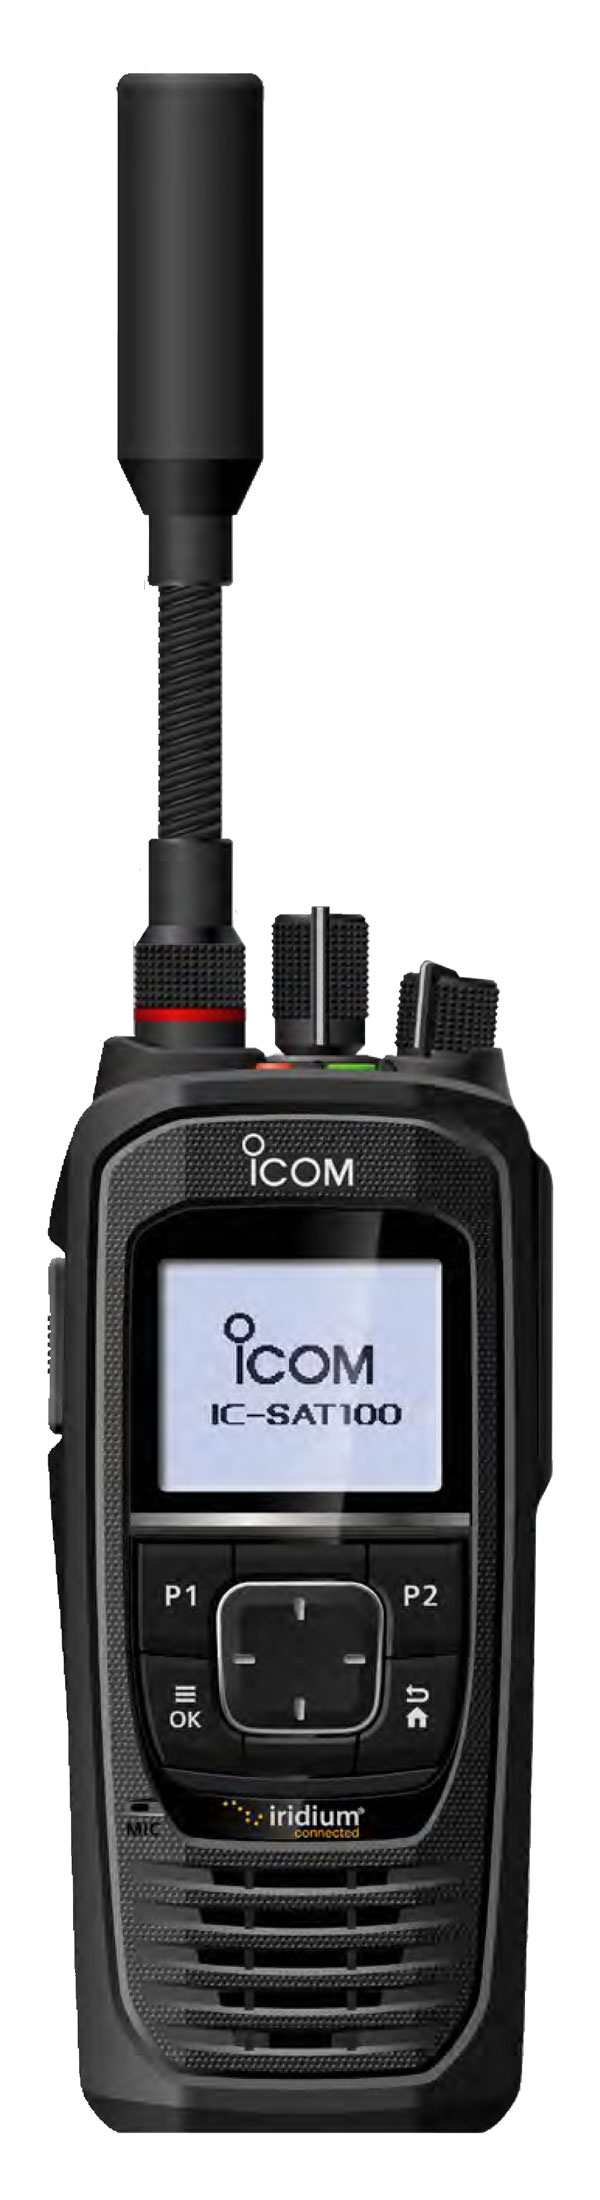 Icom Partners With Iridium: Satellite Communication Solution In Development